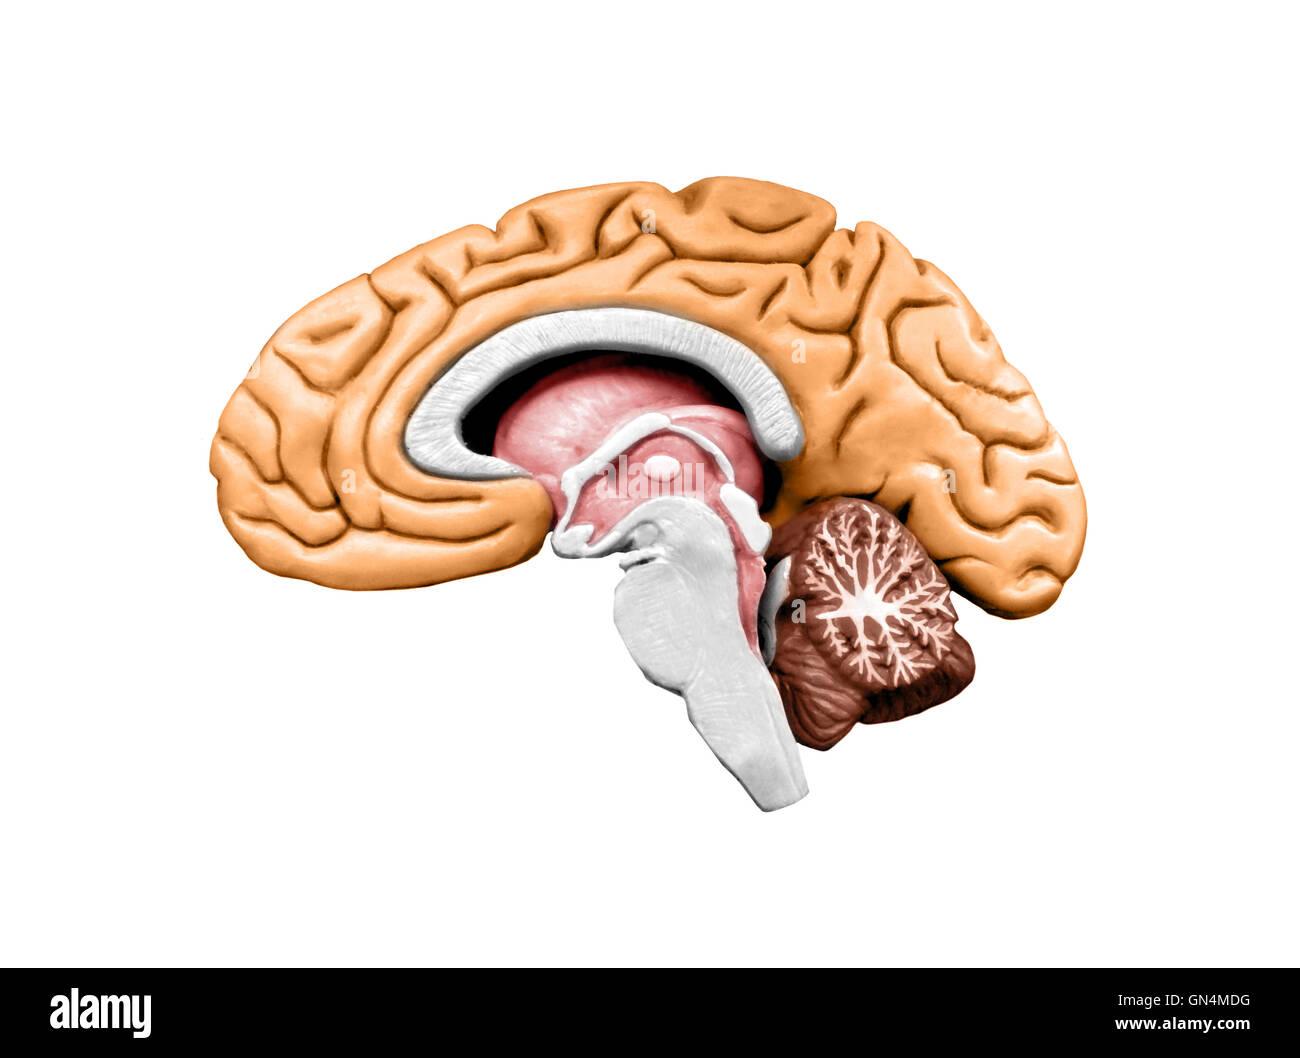 Brain model - Stock Image